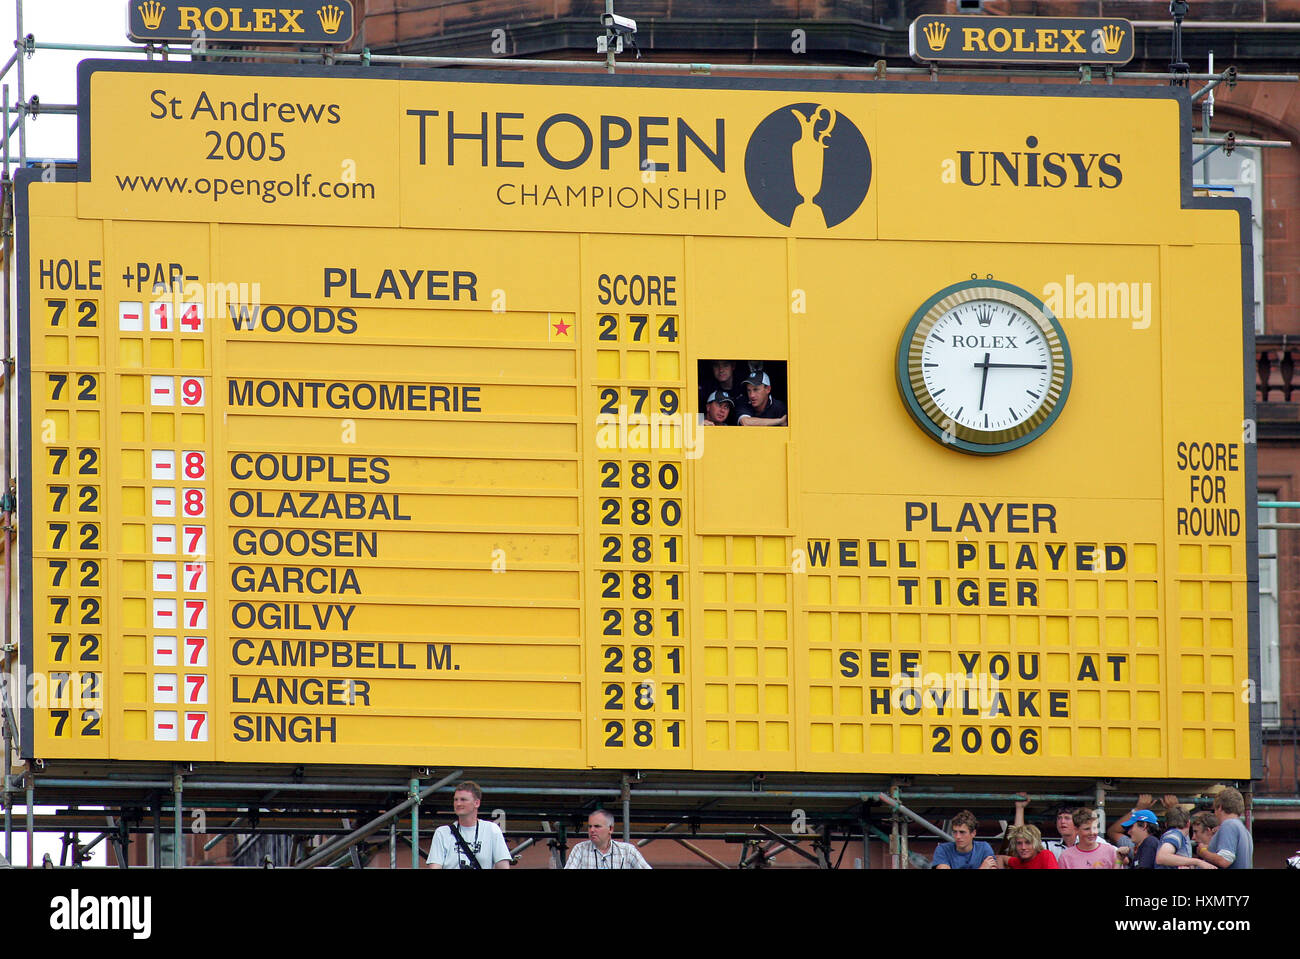 Open Golf Scoreboard Leaderboard Stock Photos & Open Golf Scoreboard ...